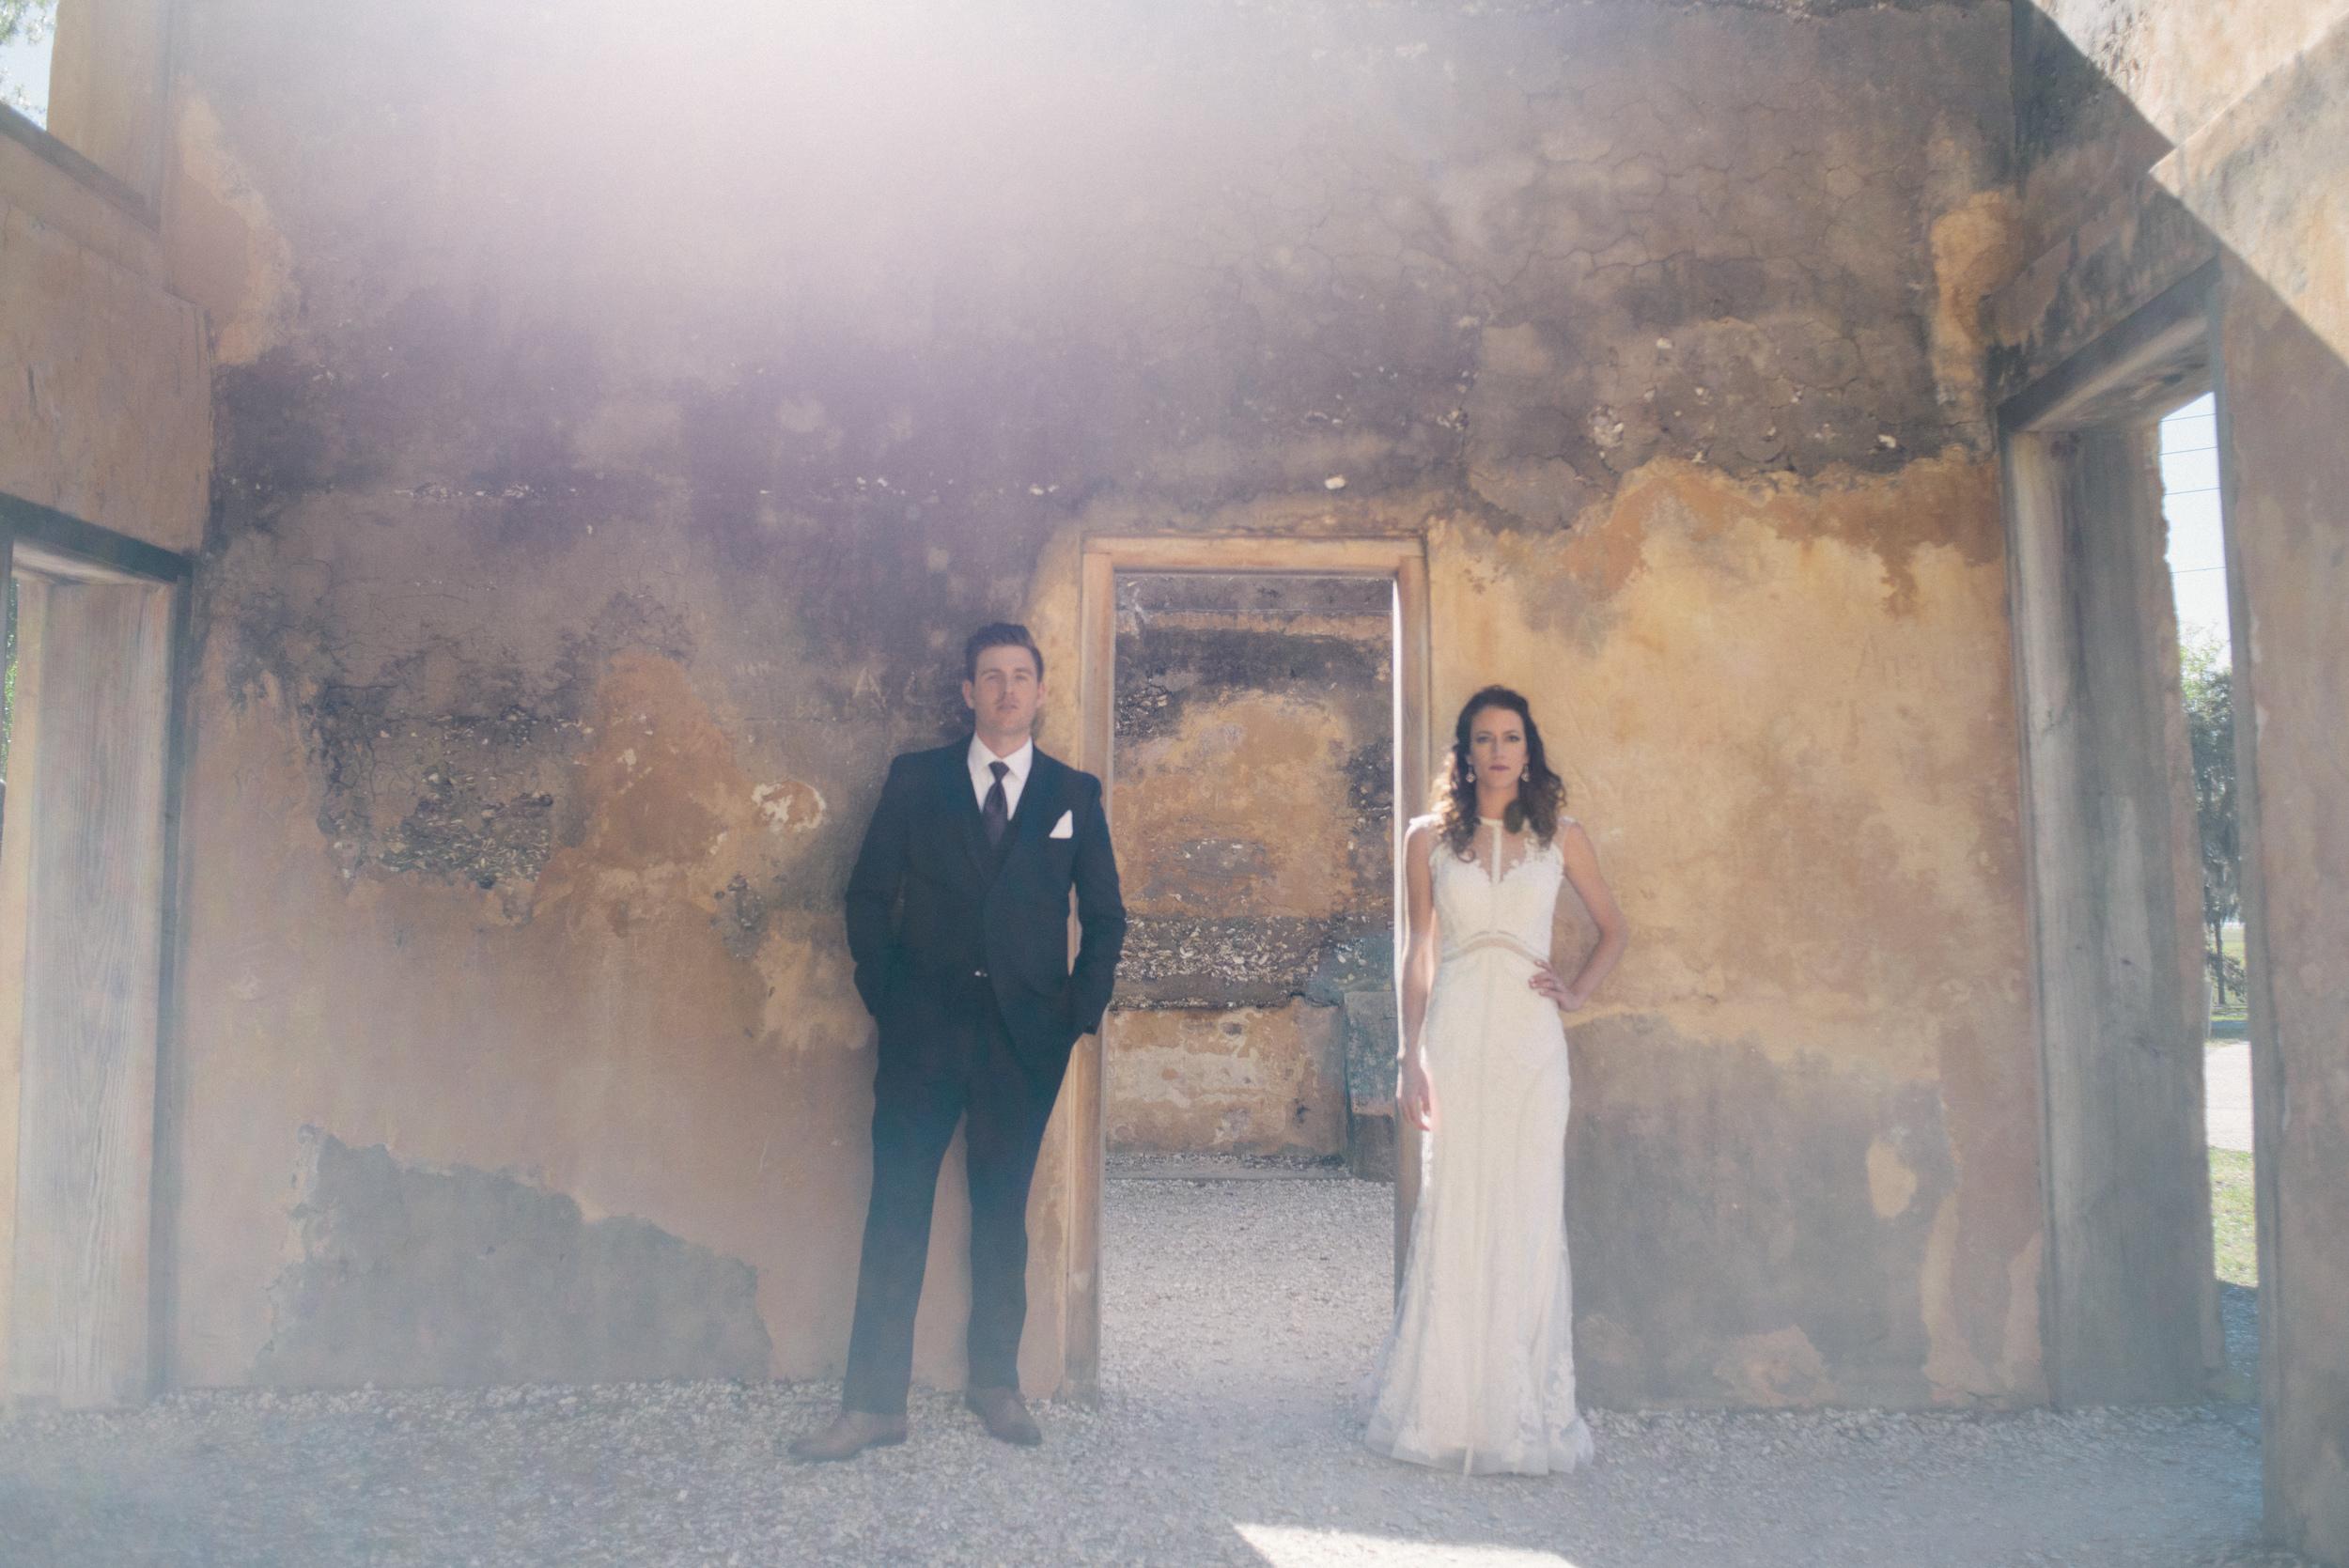 kadi-and-matt-carroll-april-9-2016-jekyl-island-wedding-m-newsom-photography- (282 of 744).jpg